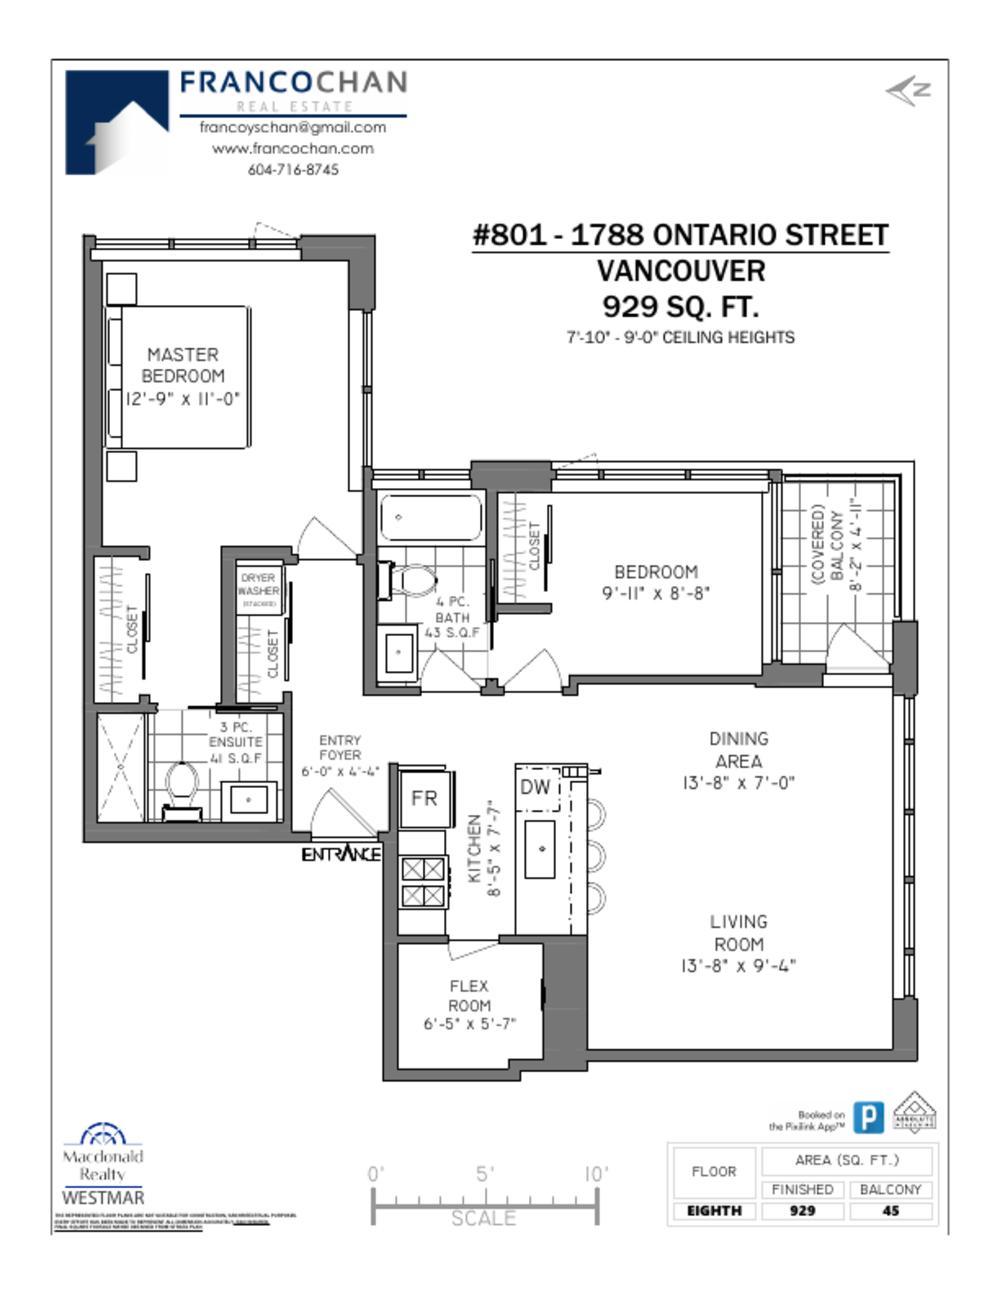 Absolute Measuring Real Estate 2d Floor Plans